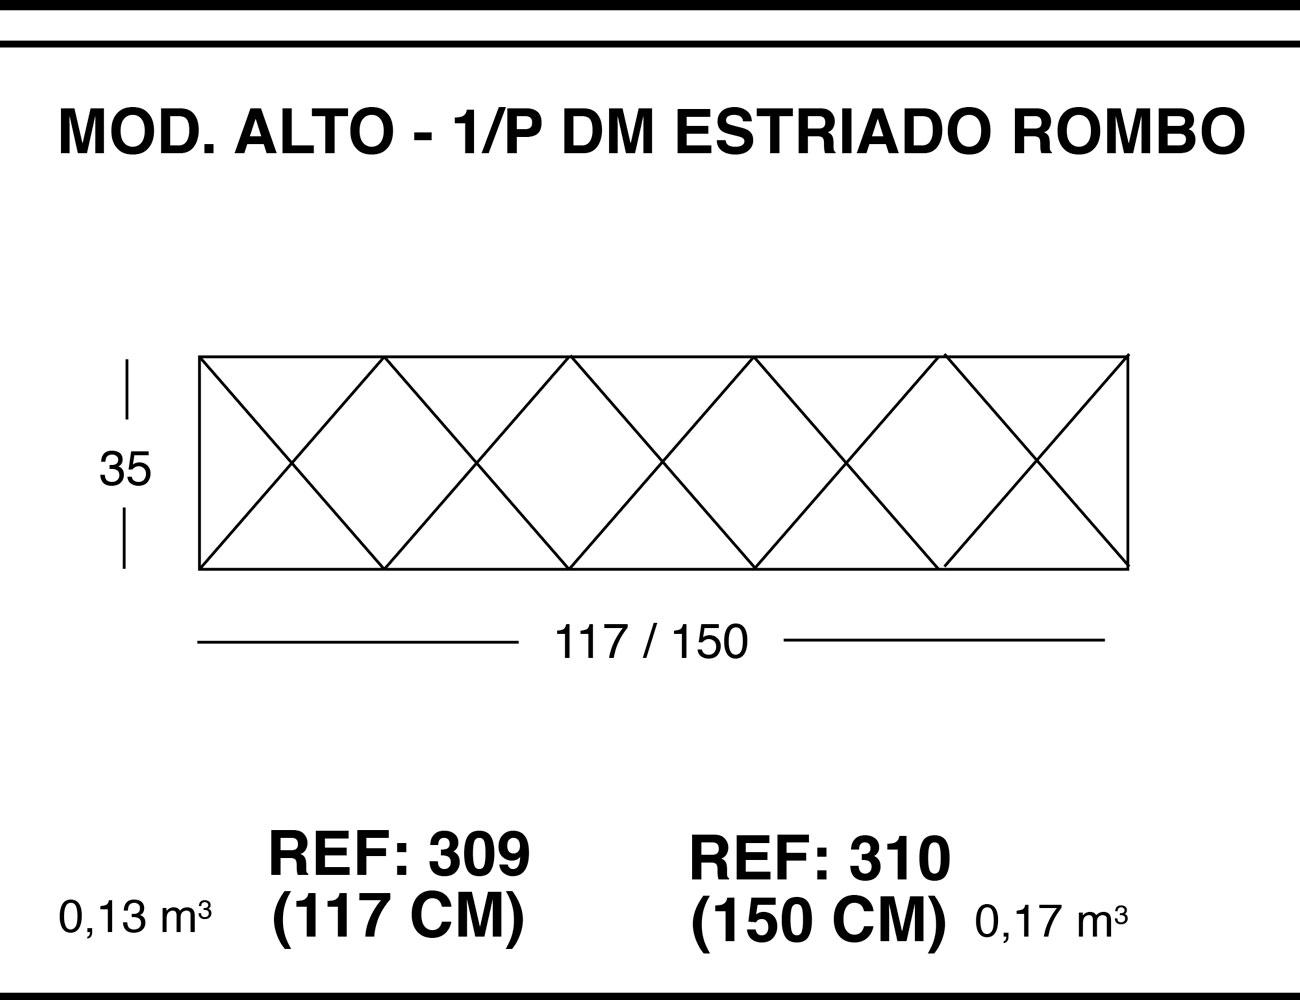 Modulo alto 1p dm estriado rombo1